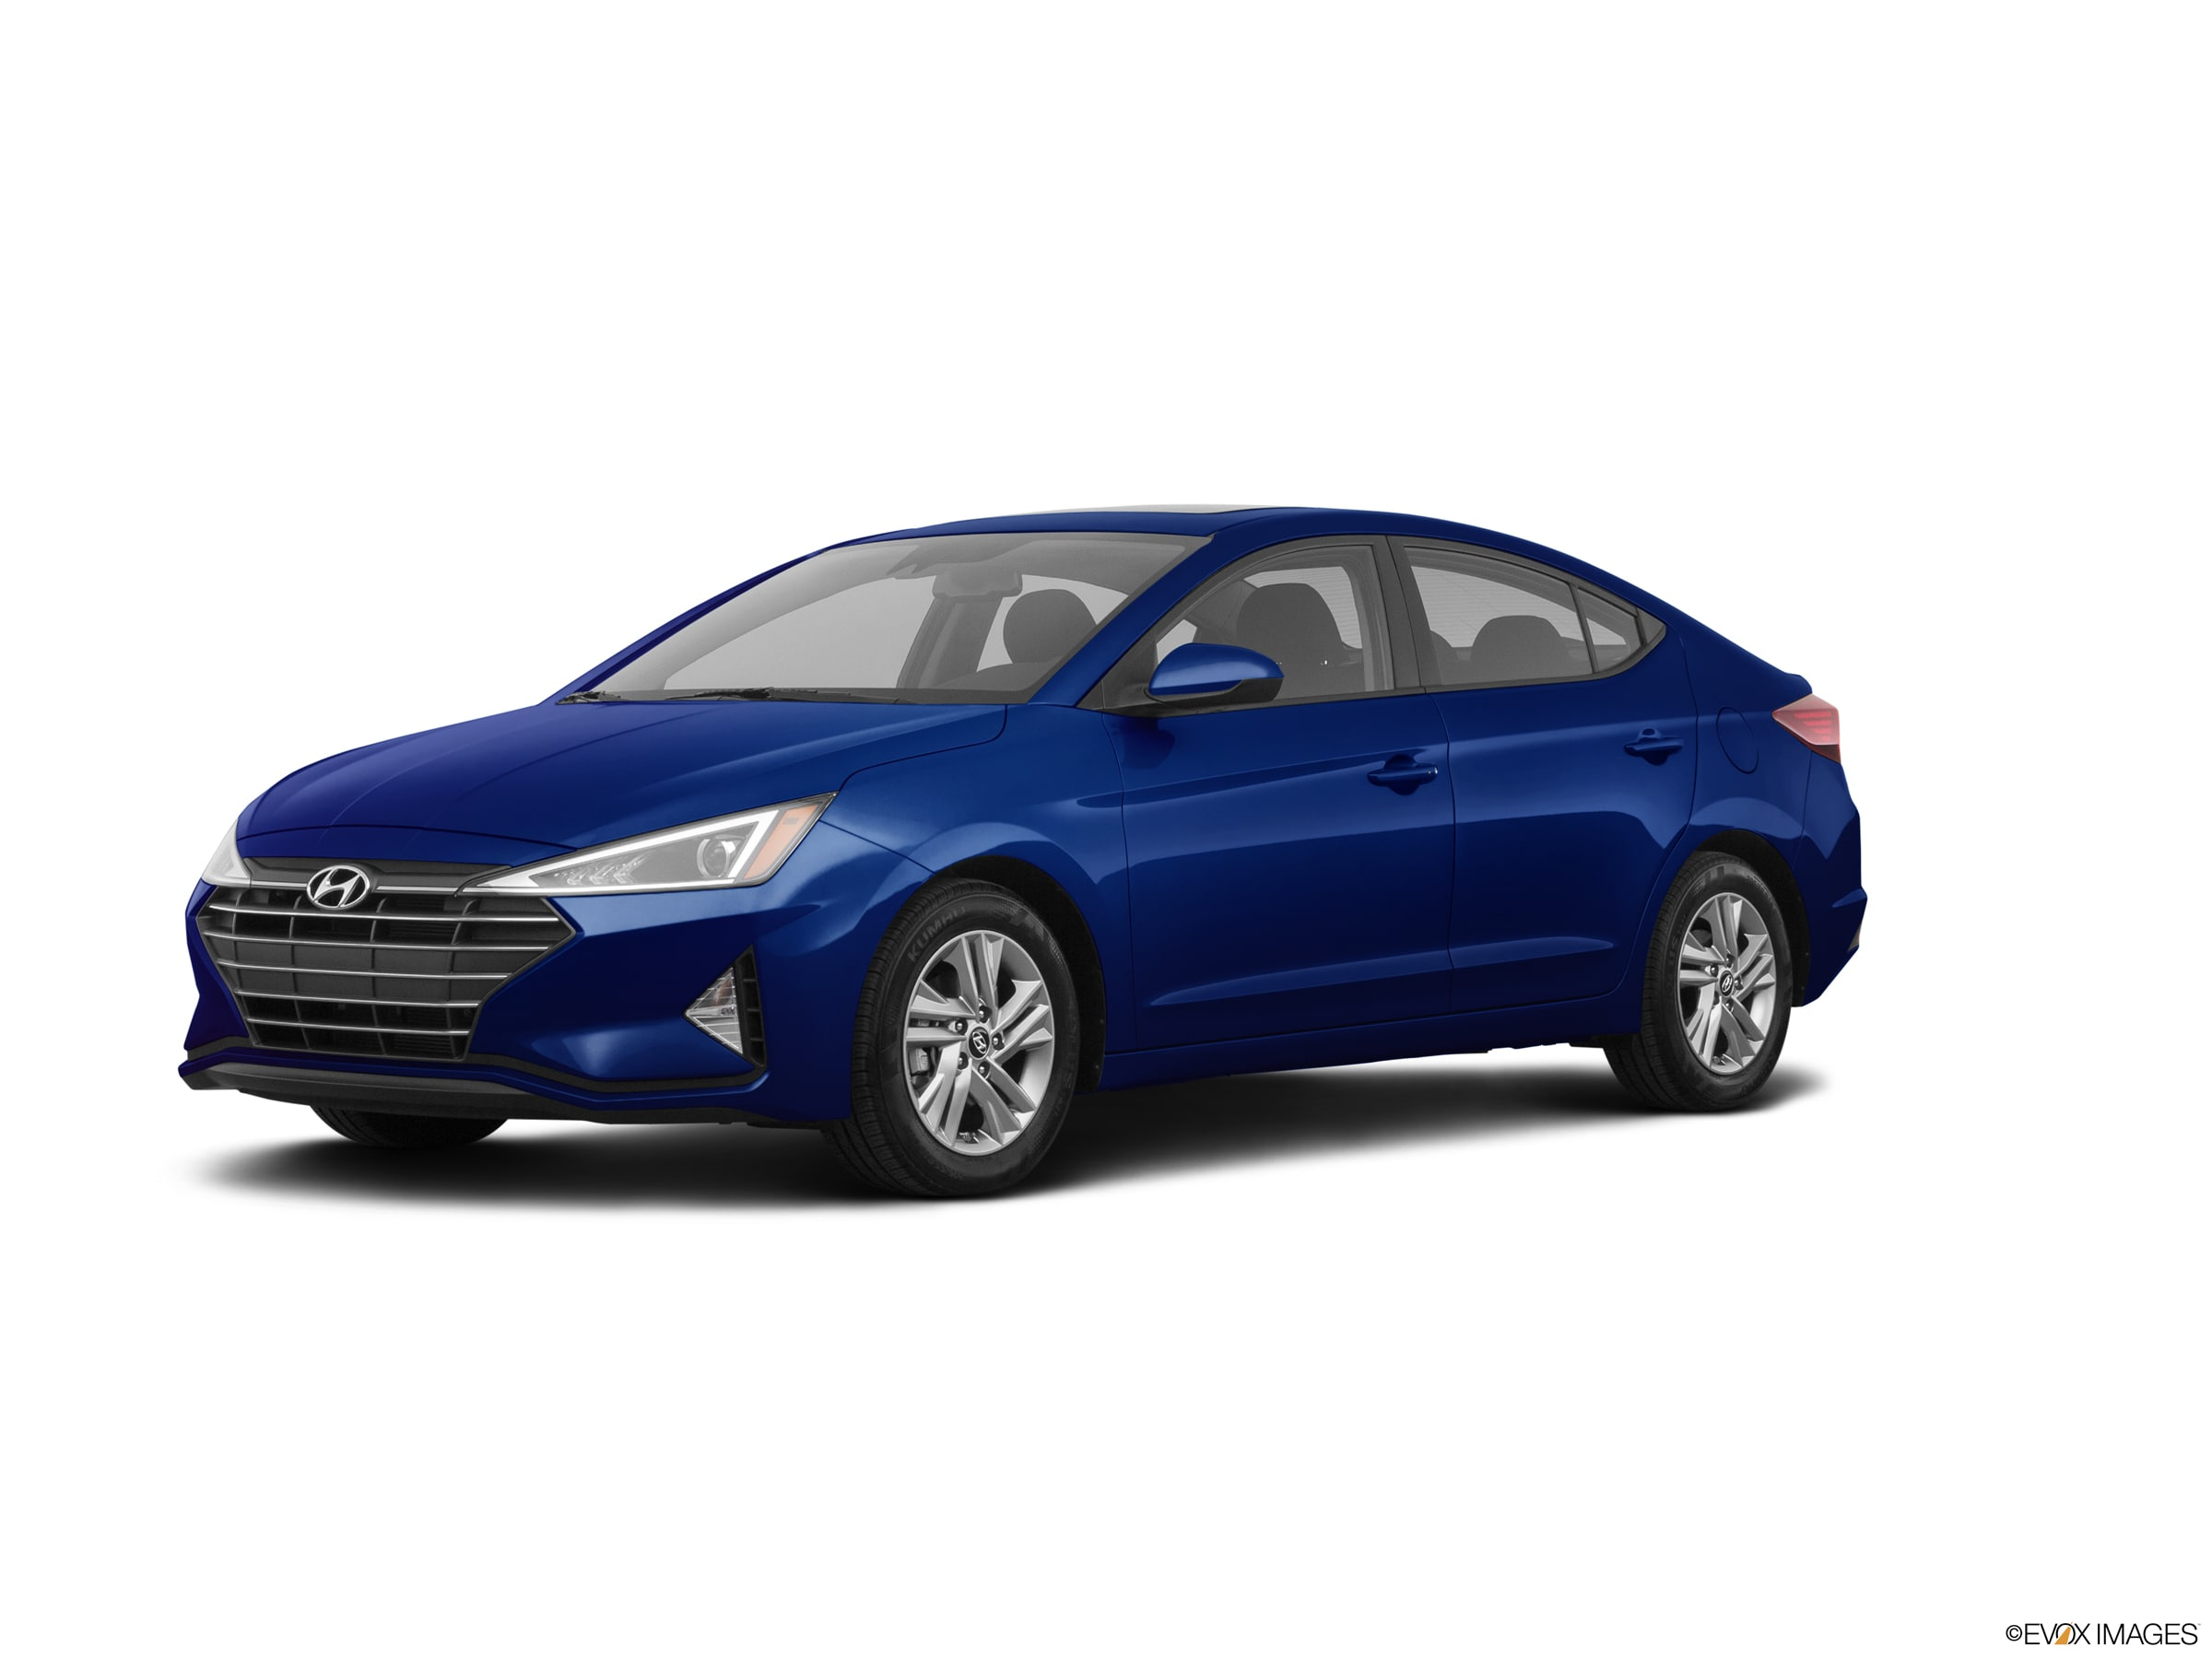 used 2019 Hyundai Elantra car, priced at $17,998